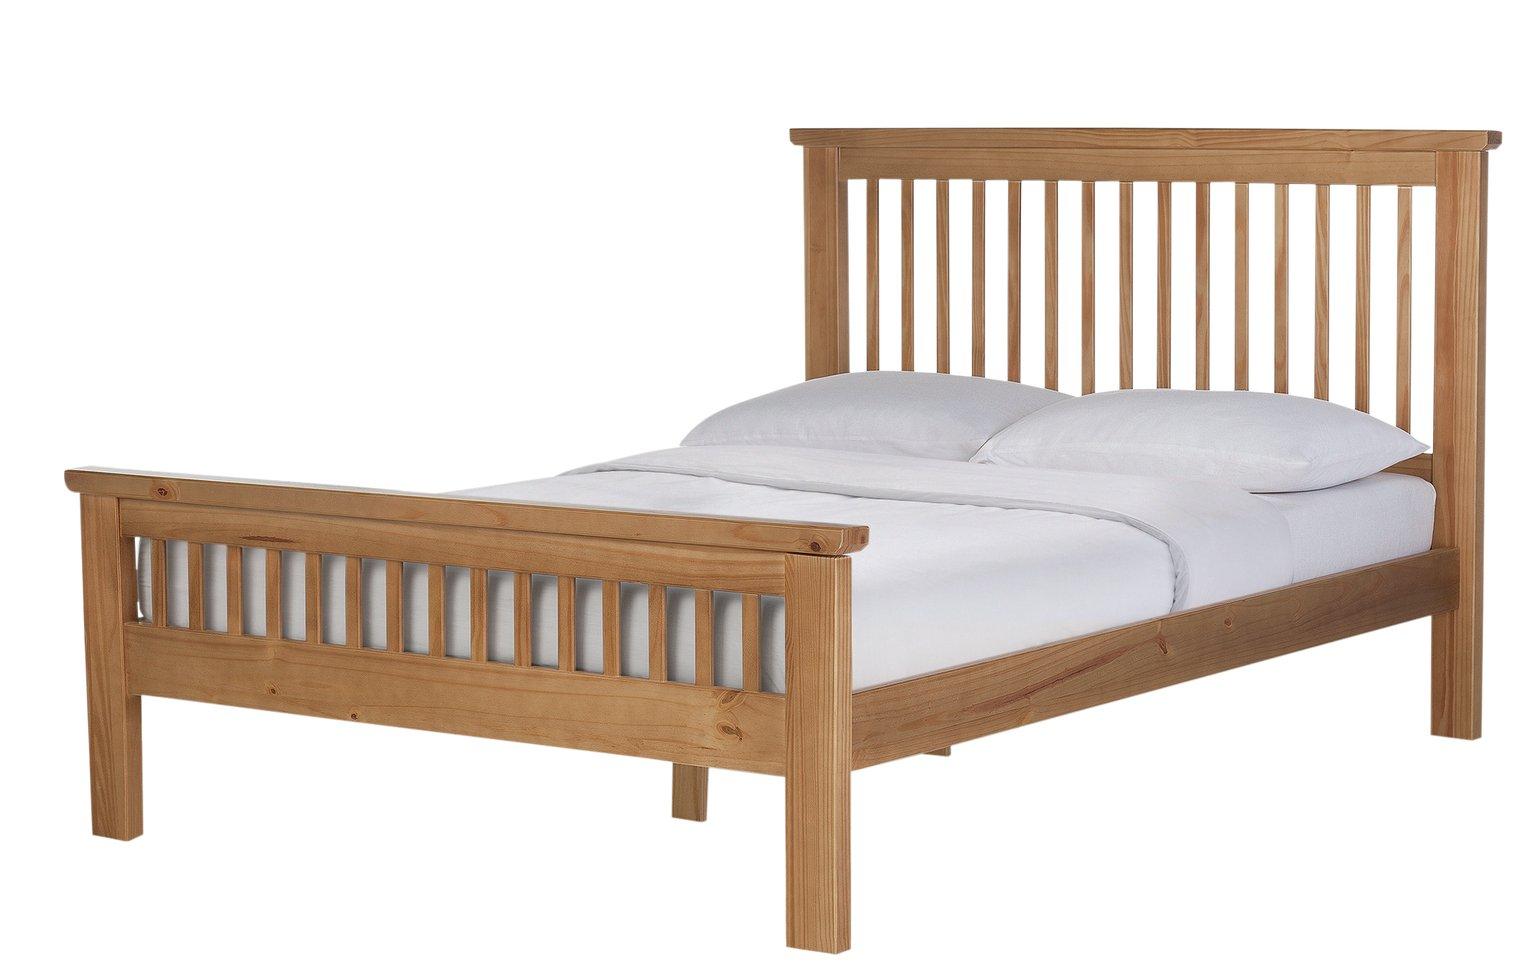 Argos Home Aubrey Double Bed Frame - Oak Stain